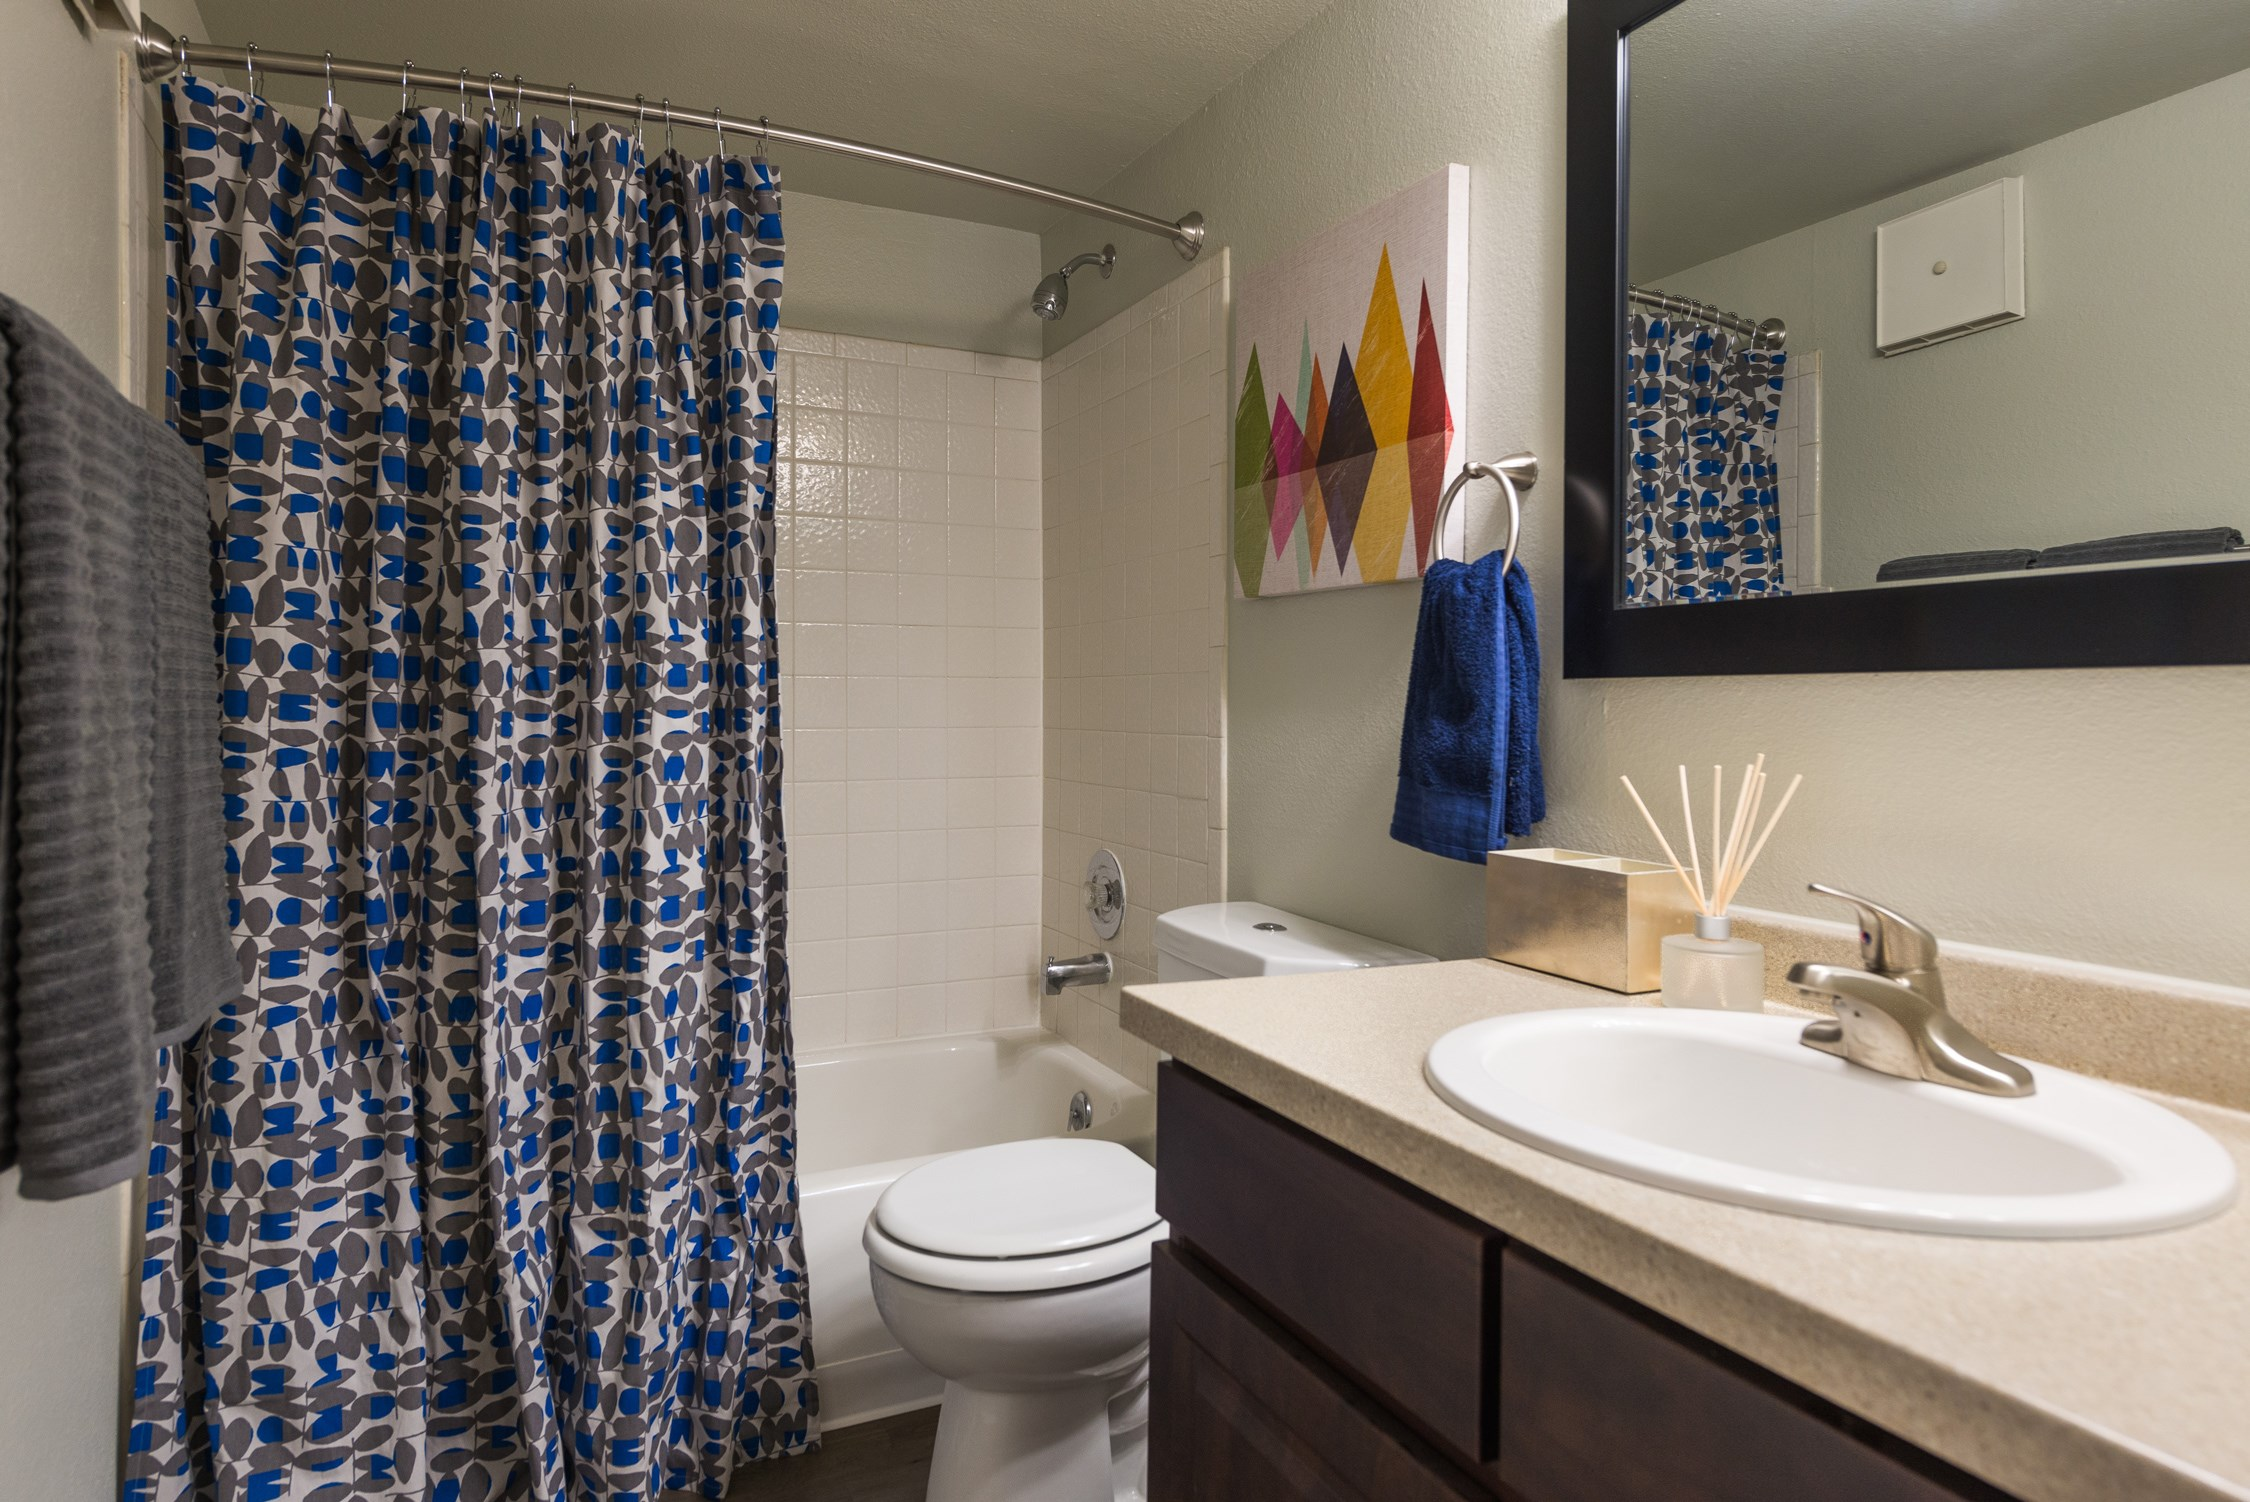 Bathroom at Conifer Creek Apartments in Aurora, IL